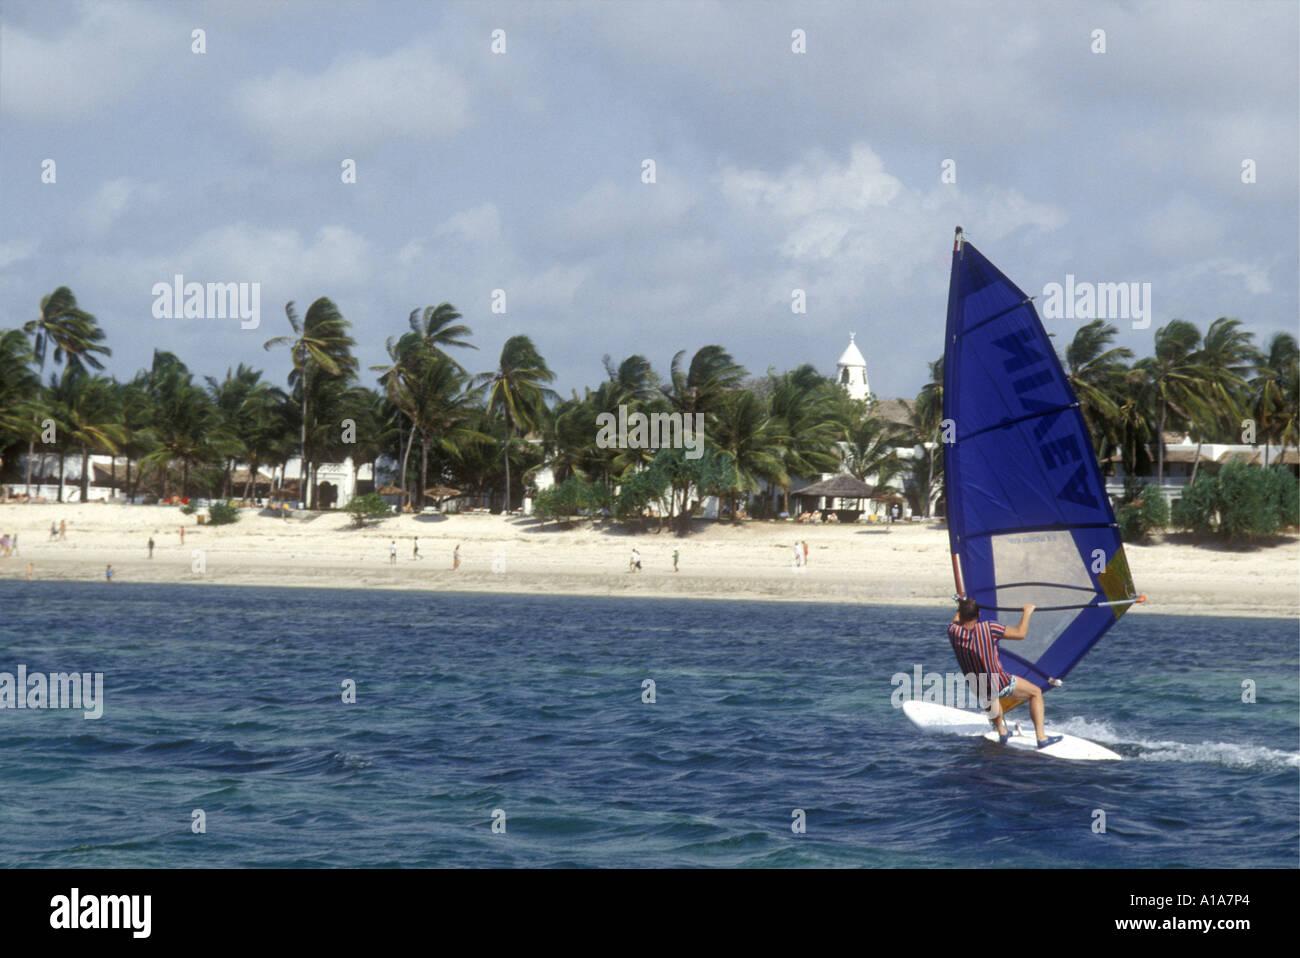 Windsurfing near Serena Beach Hotel Kenya coast East Africa - Stock Image